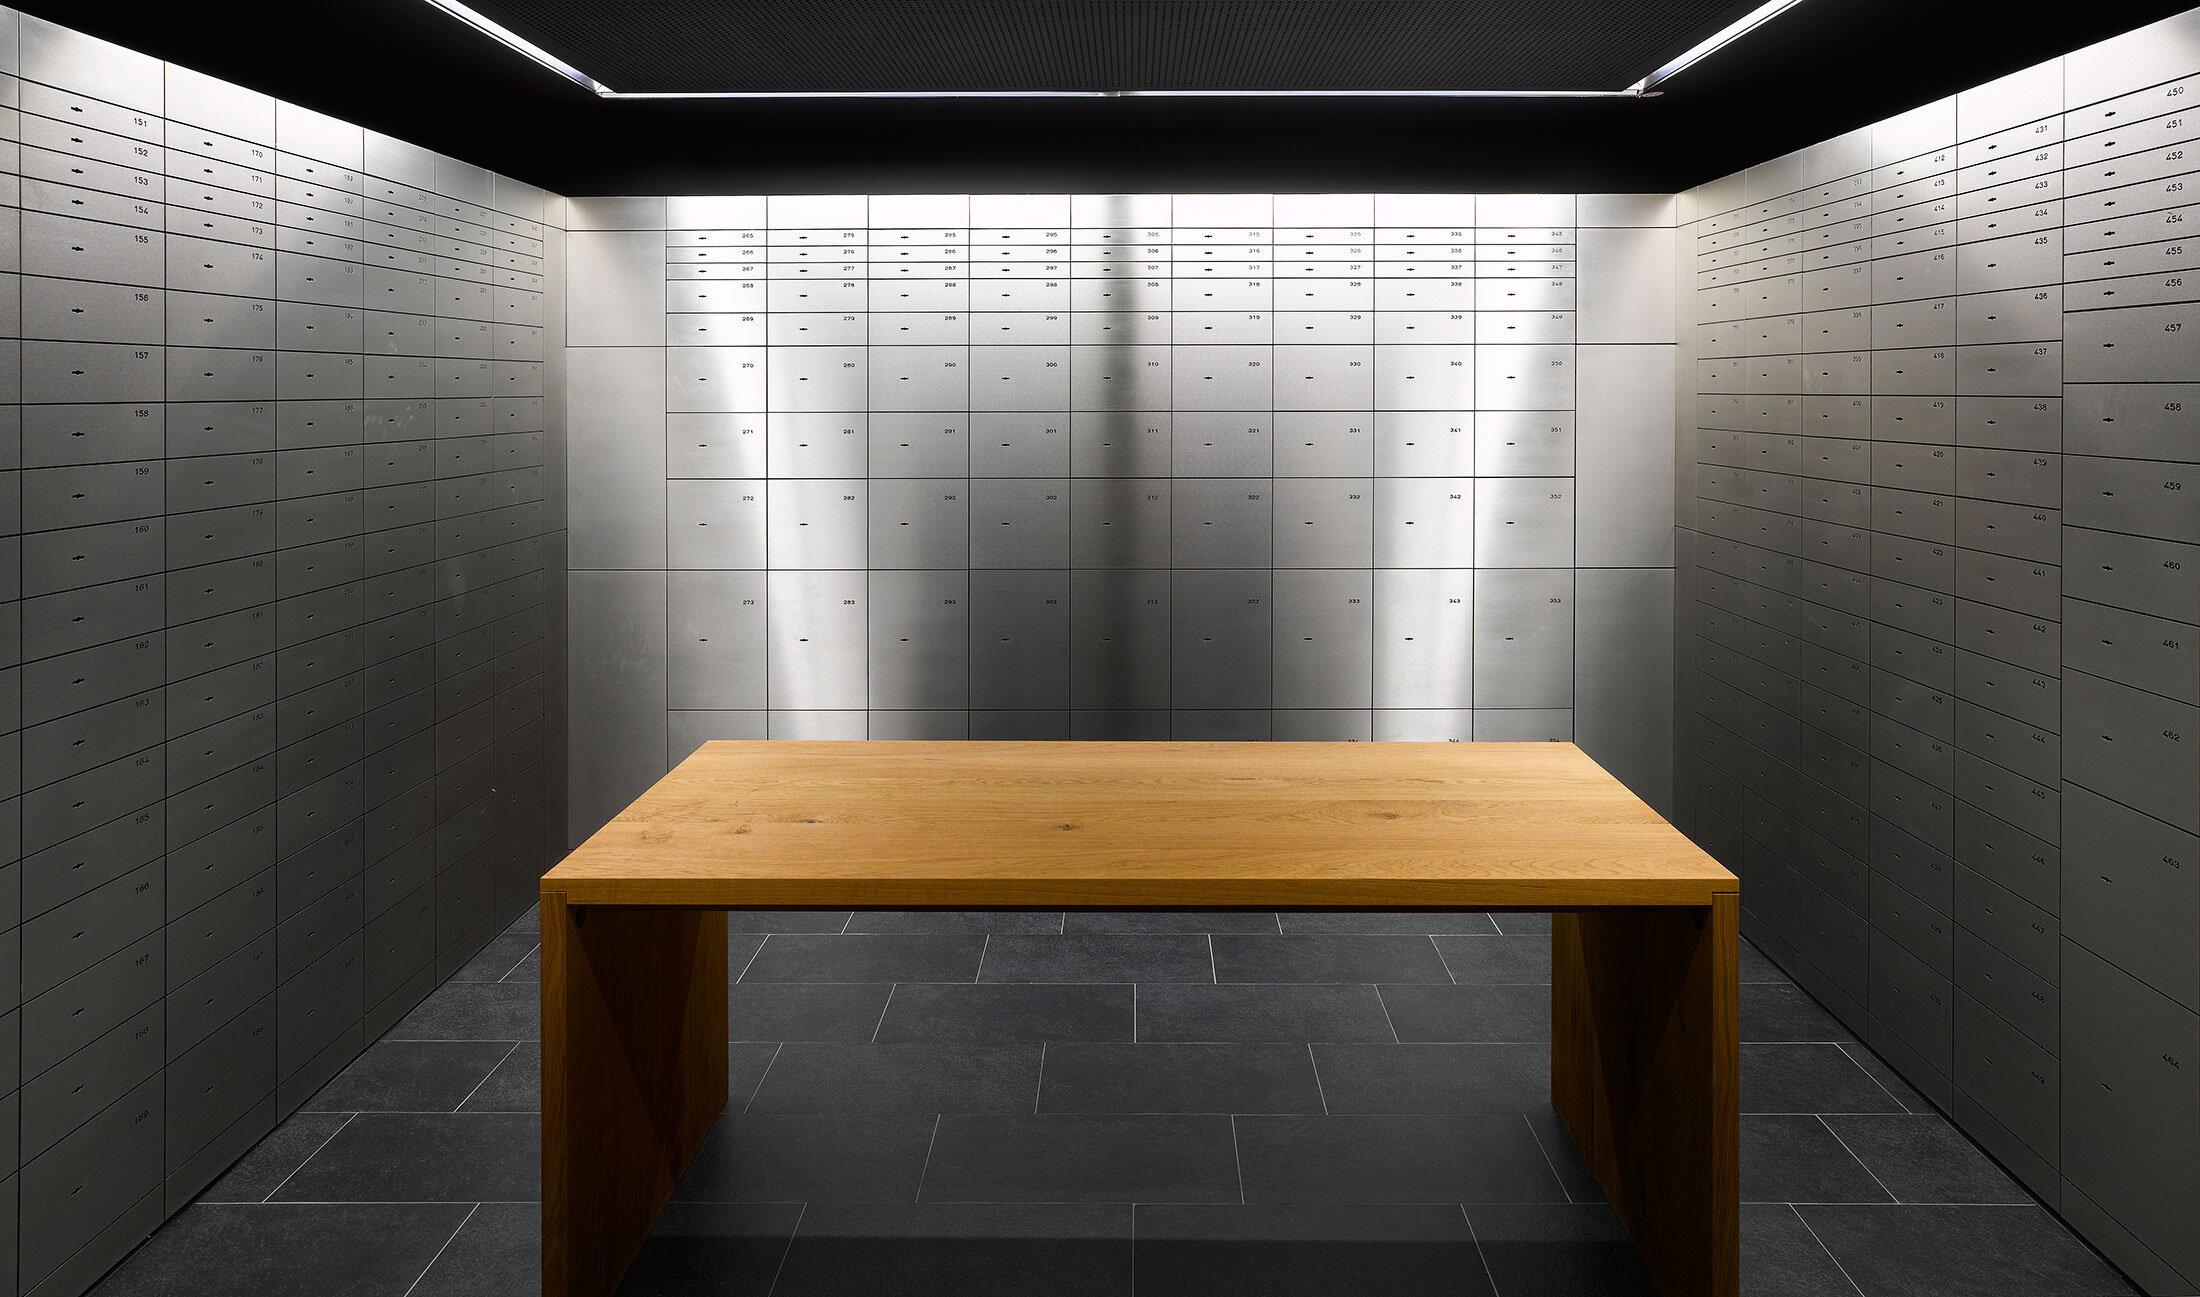 herrmann bosch architekten stuttgart teckstra e 56. Black Bedroom Furniture Sets. Home Design Ideas